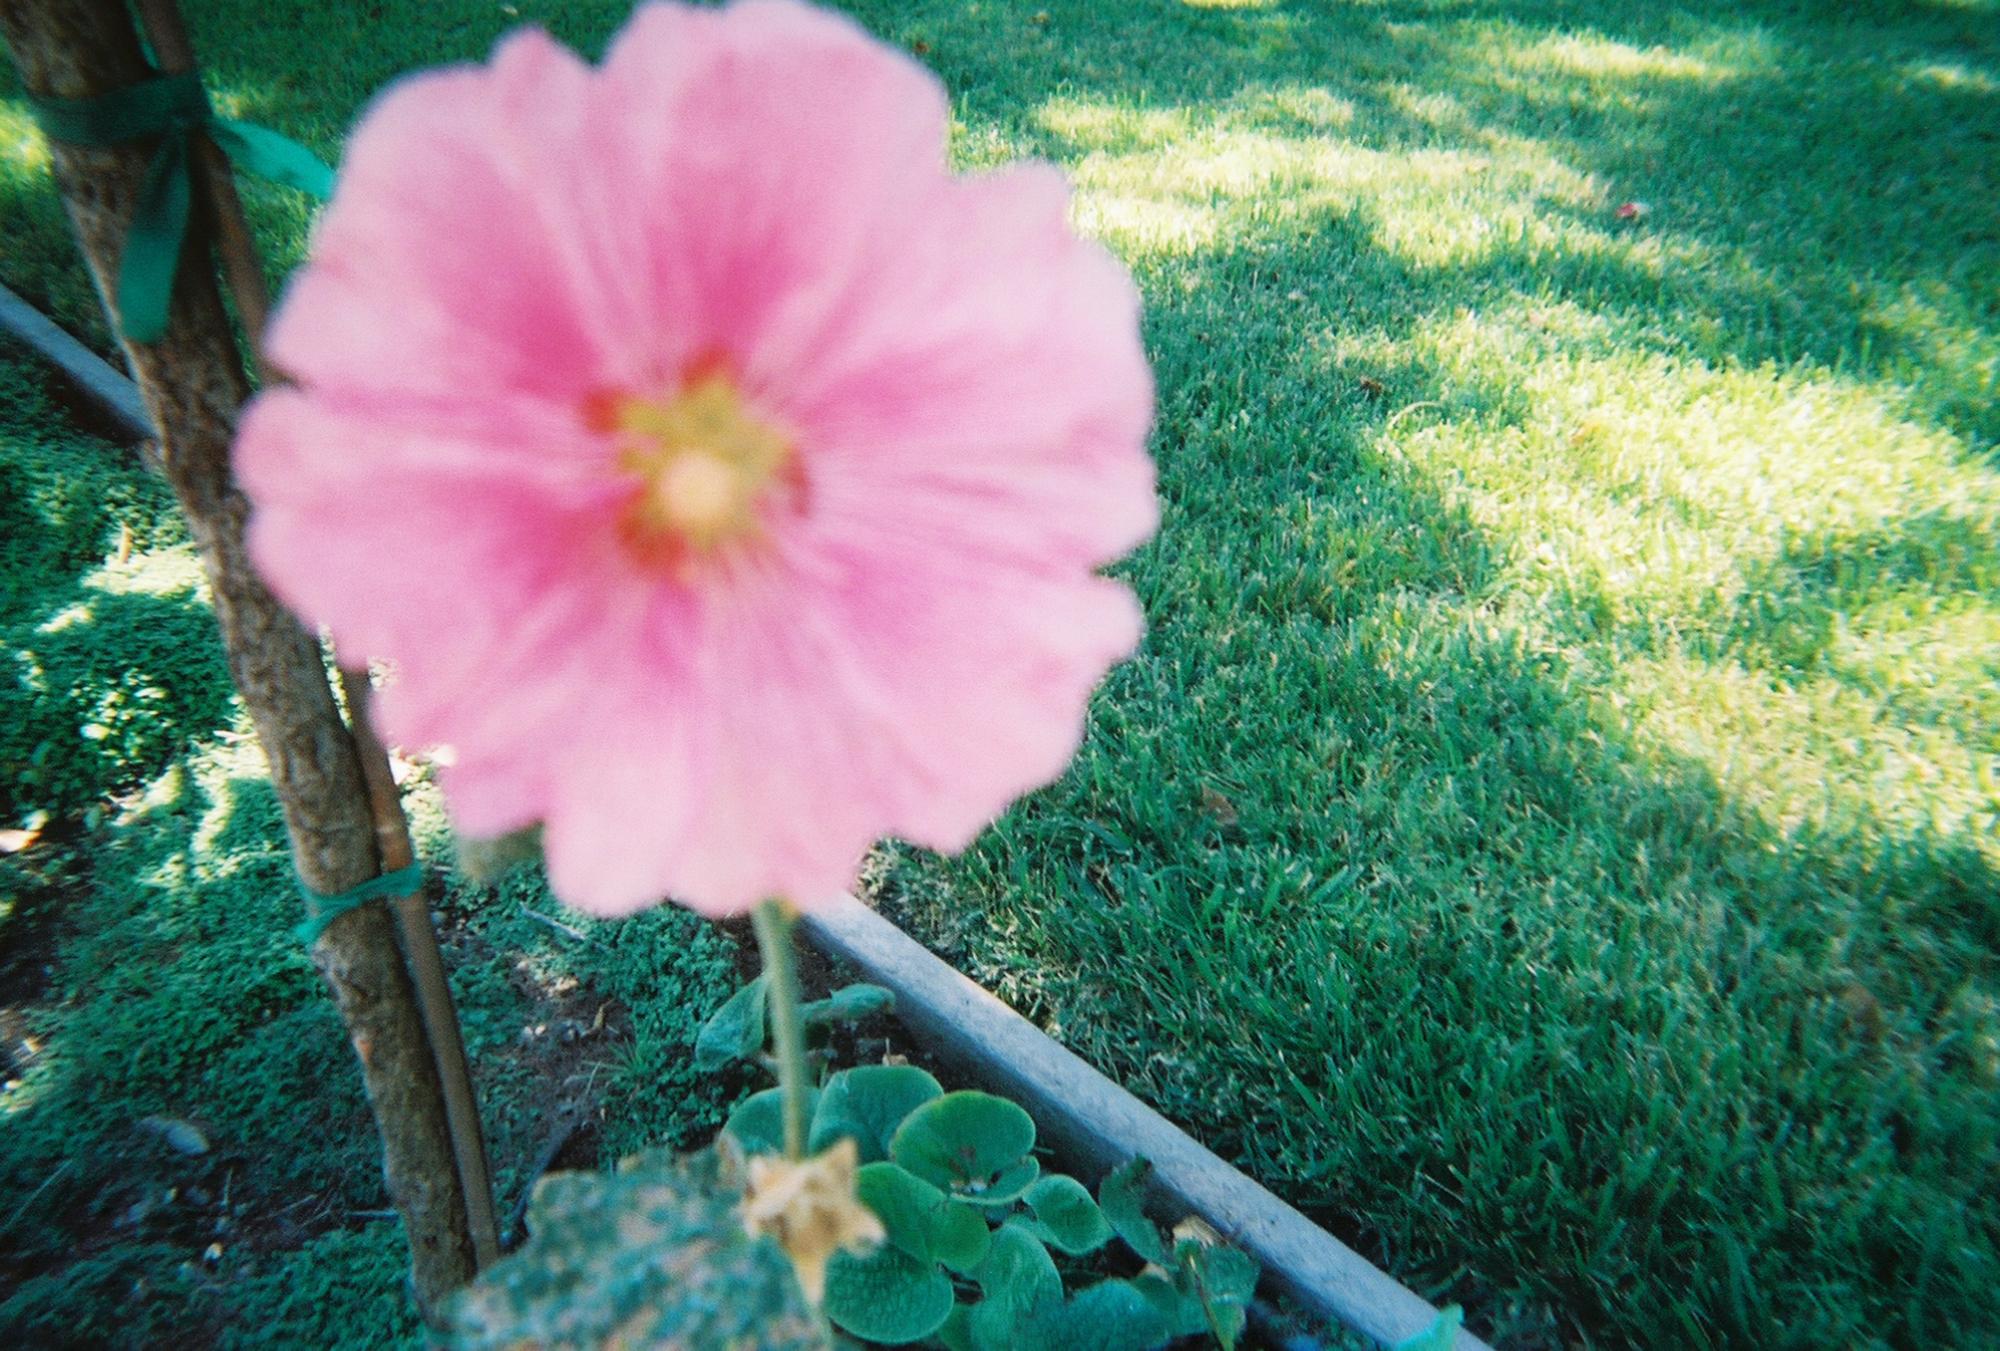 A flower in a community garden. (Photo courtesy ofSelijah Meacham.)